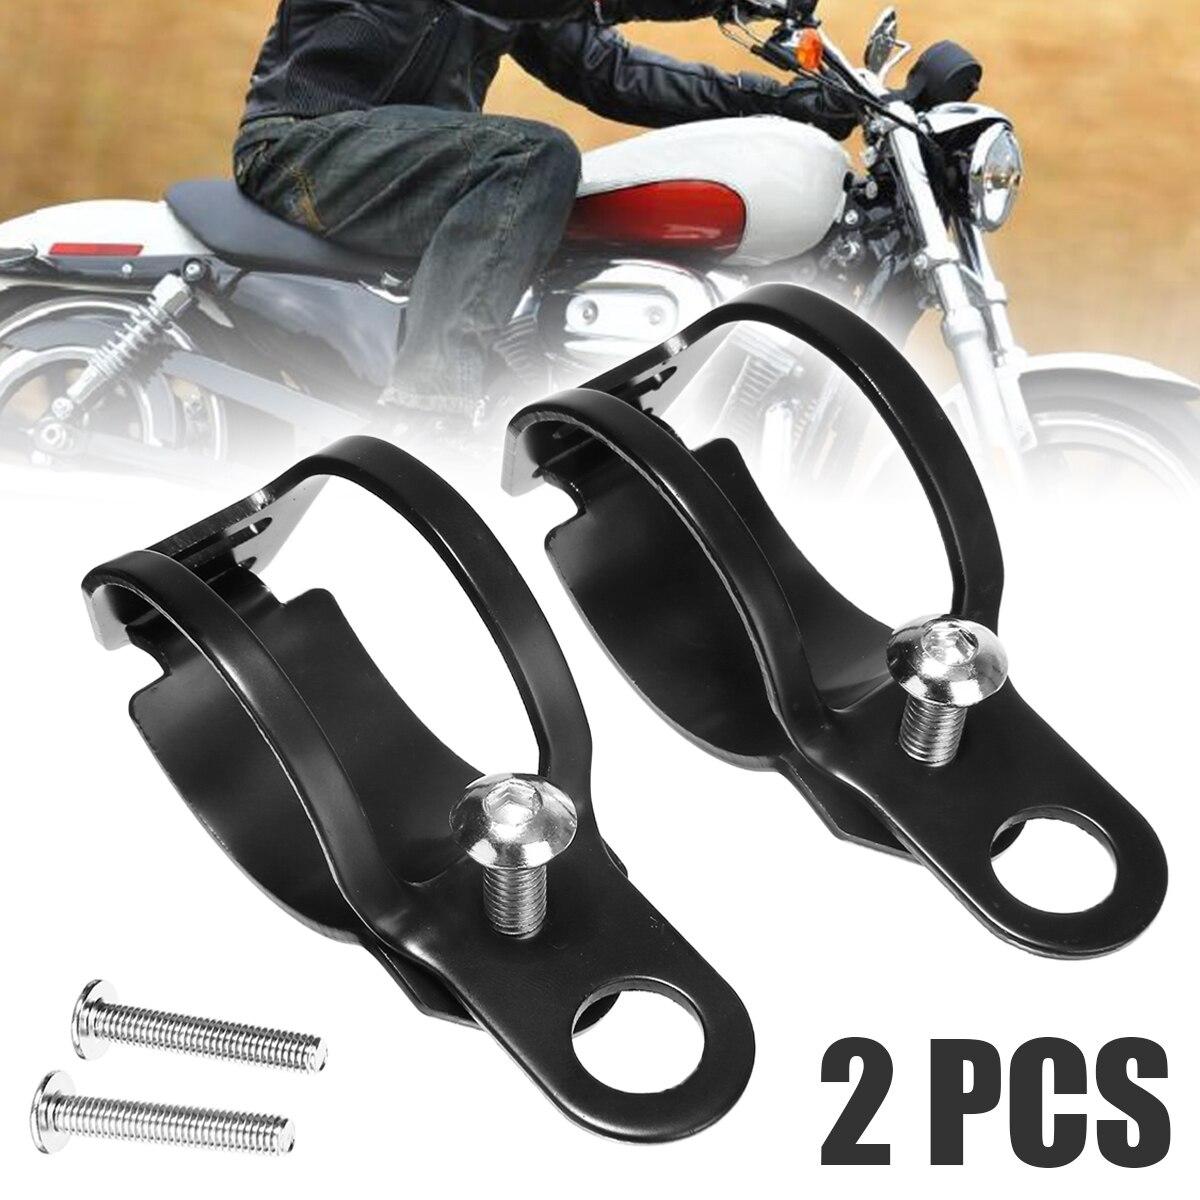 Qiilu 1 Pair of 39mm Aluminum Alloy Motorcycle Motorbike Headlight Fork Mounting Brackets Black